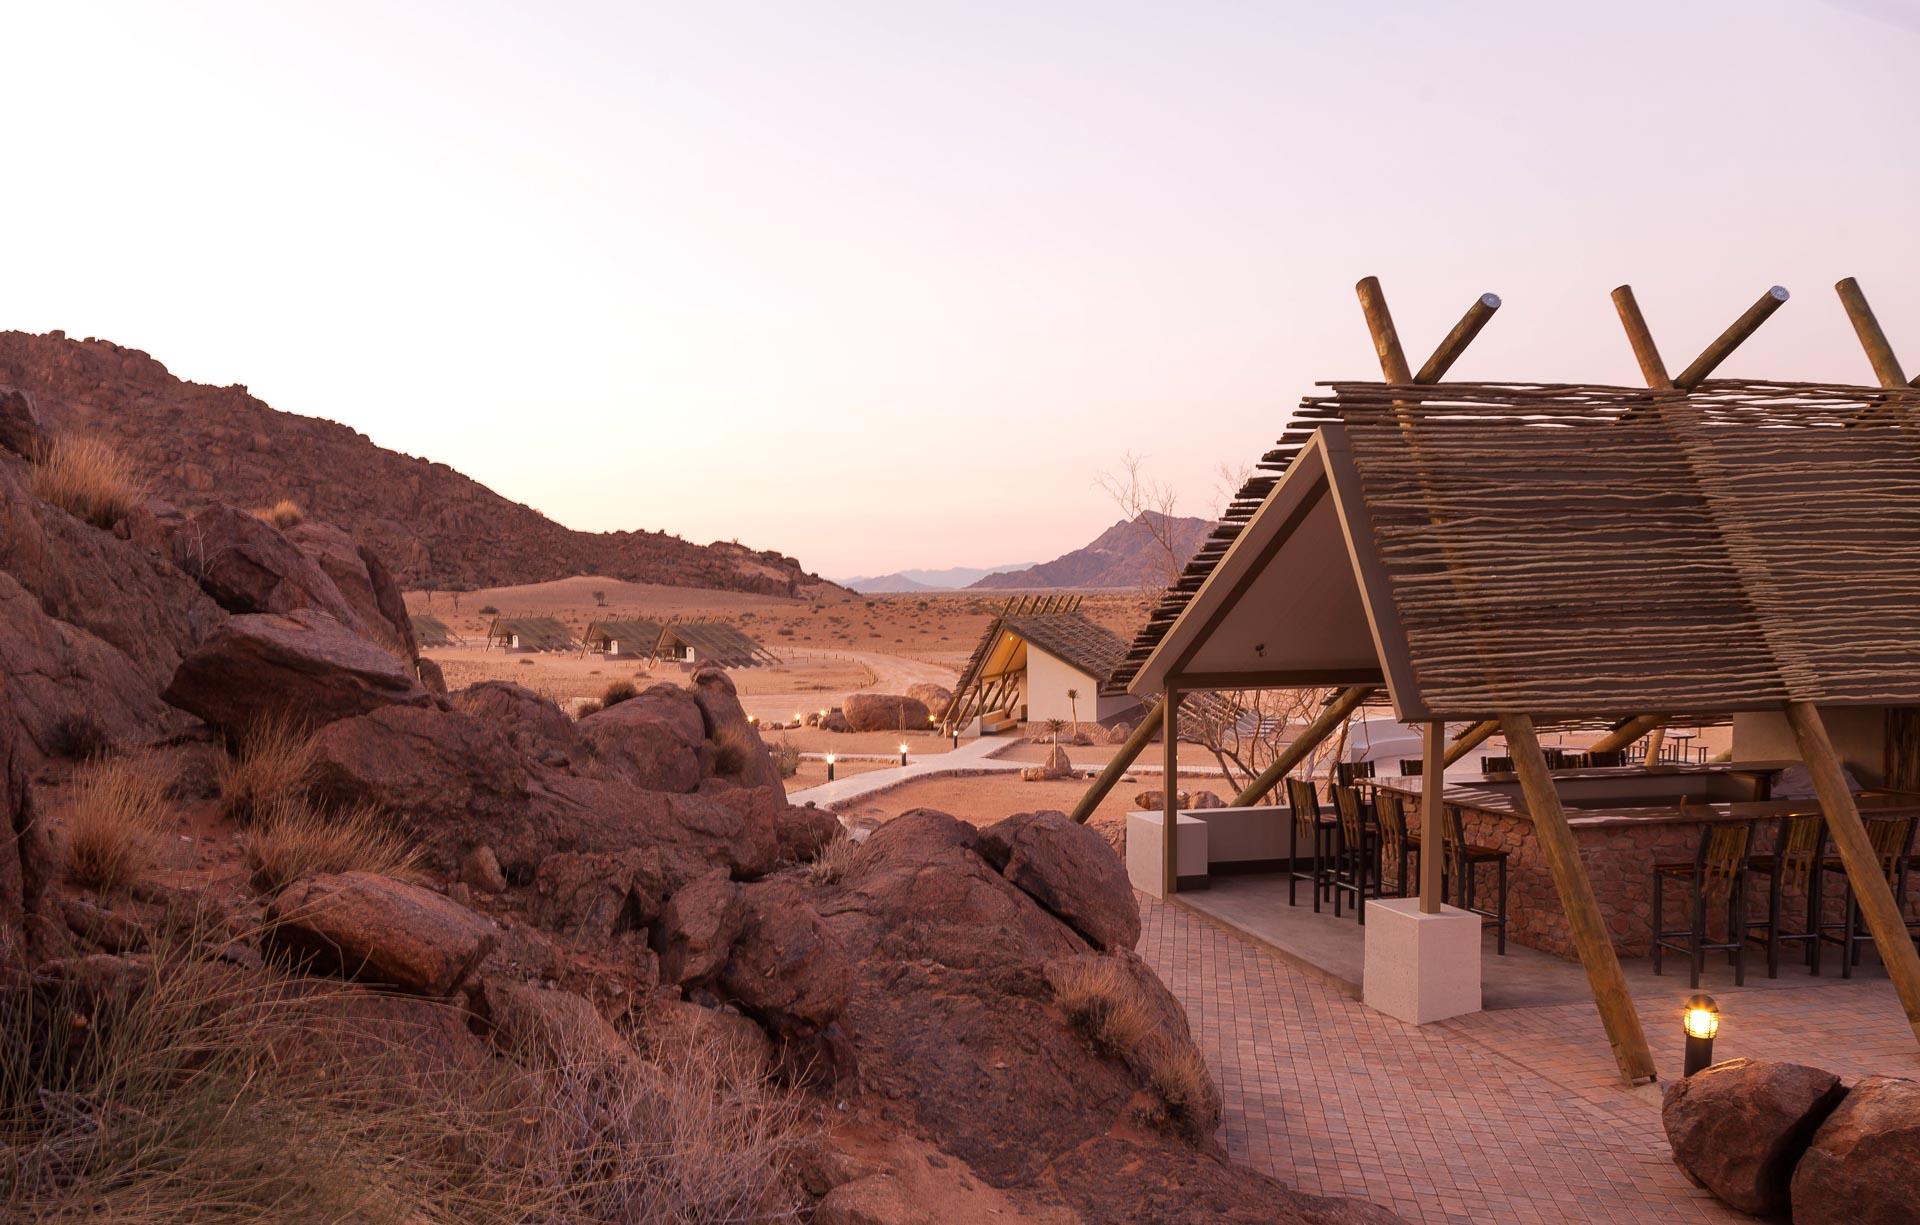 Desert-Quiver-Camp-Namibia-4